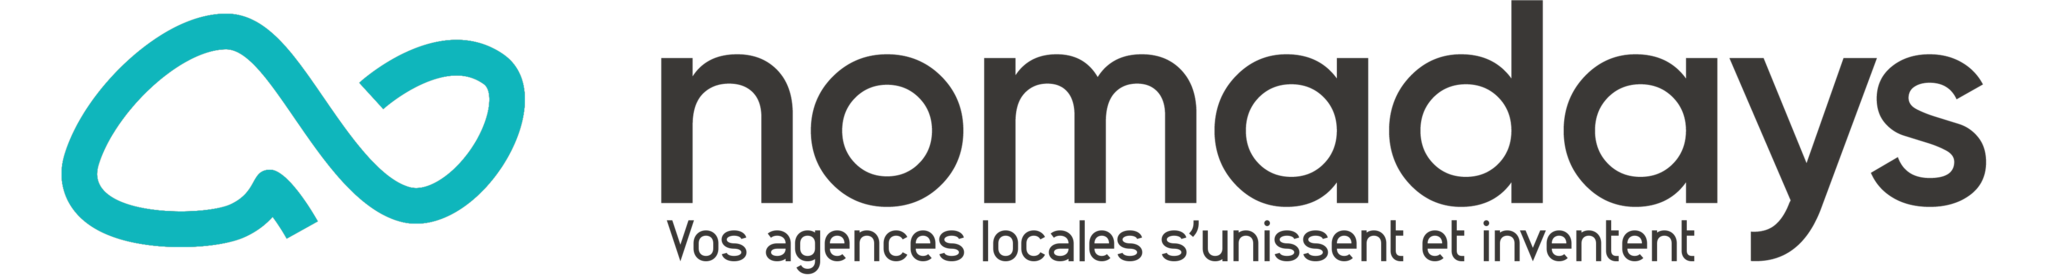 ©voyages-modestes-logo1